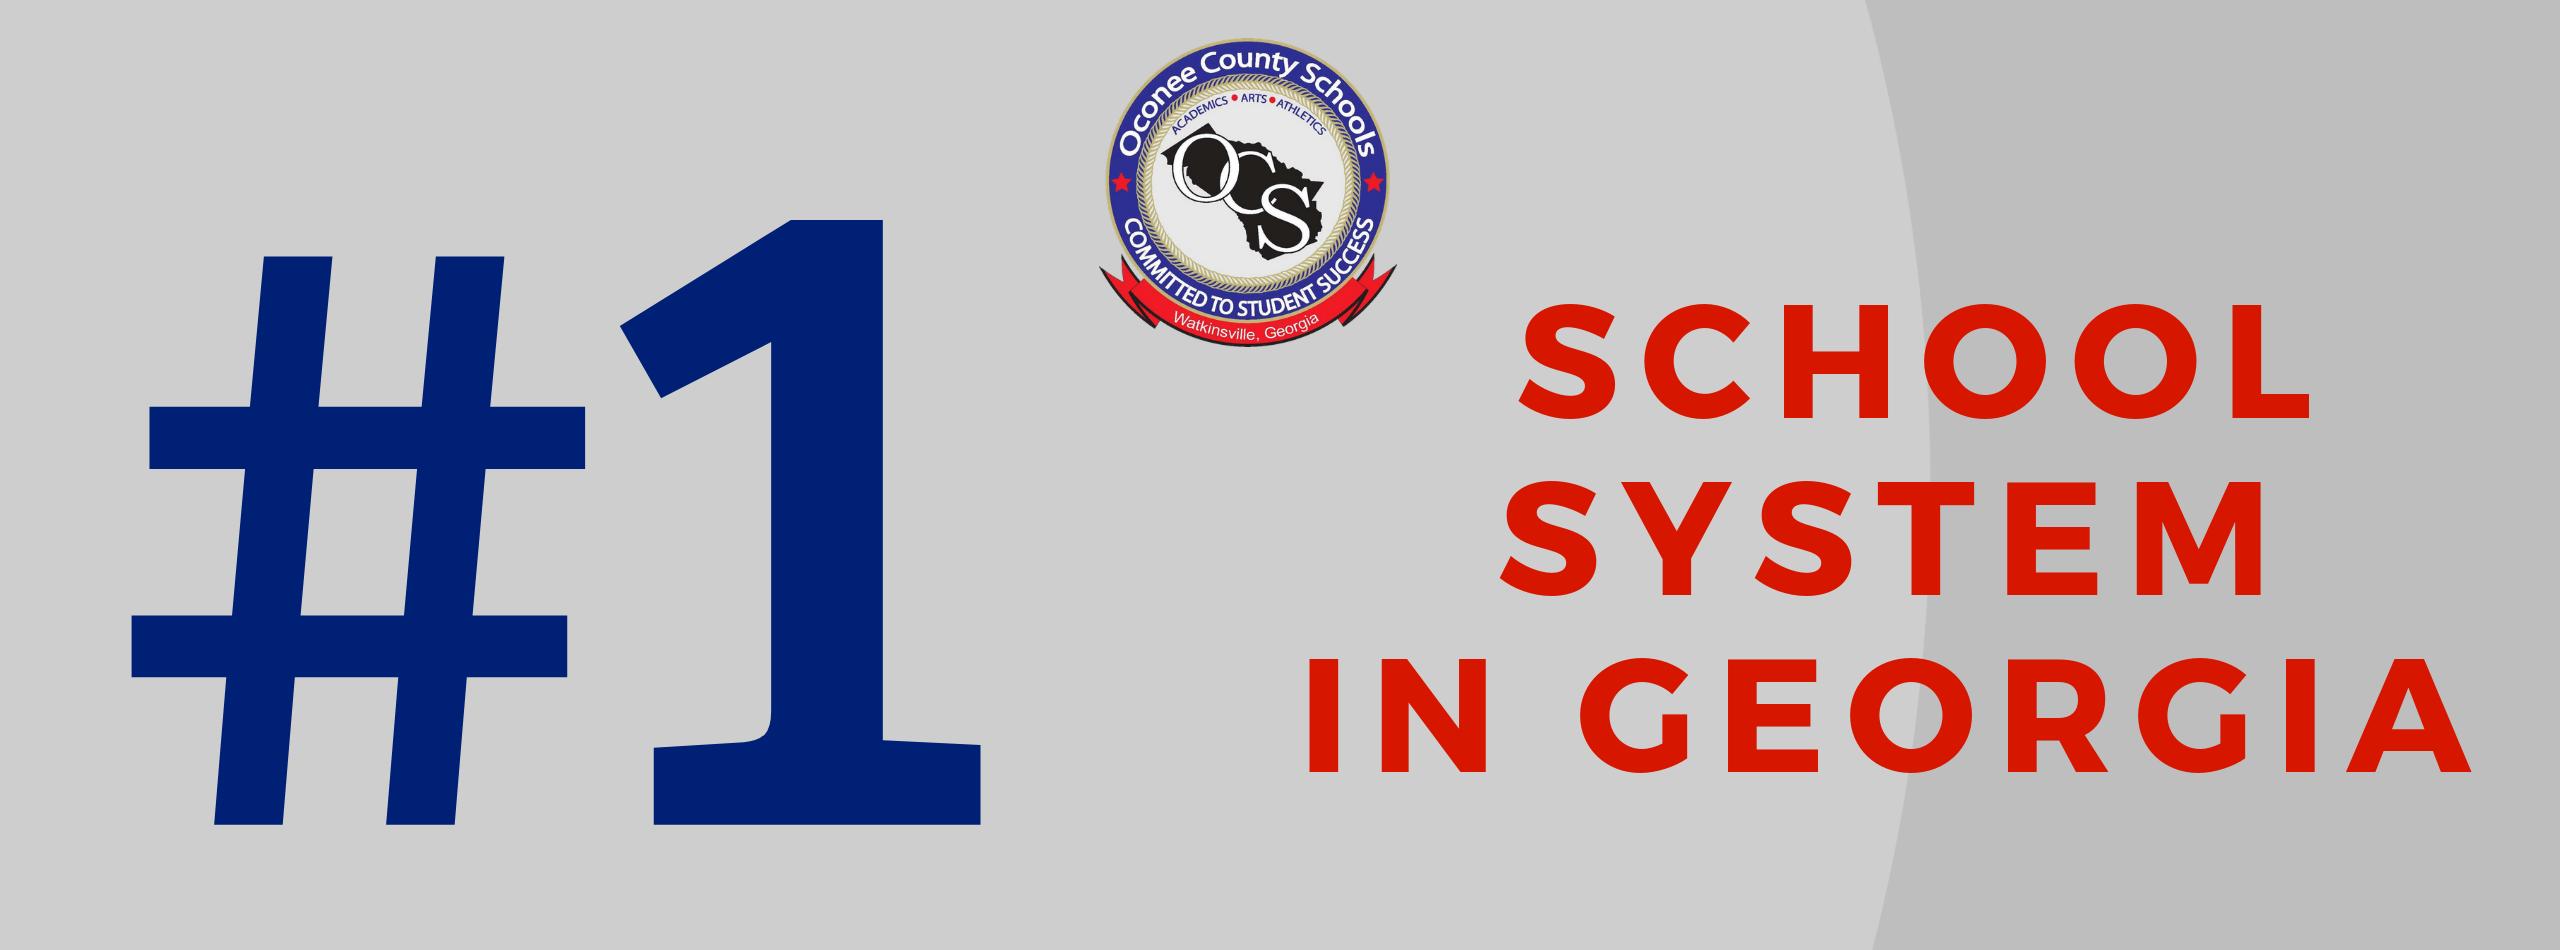 Oconee County Schools / Homepage